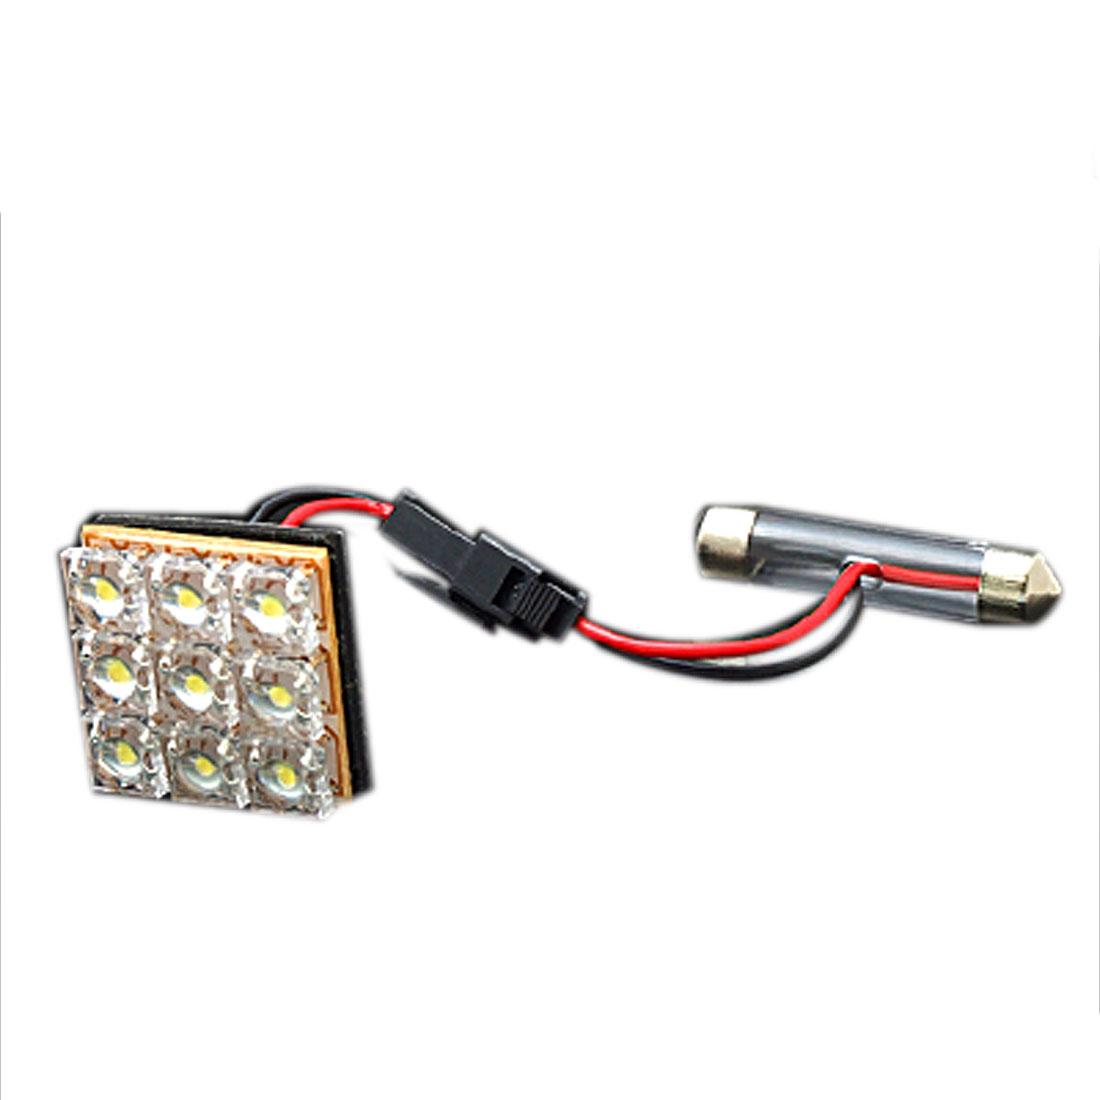 White 9 LED Auto Car Interior Dome/Door/Box Light Lamp Bulb